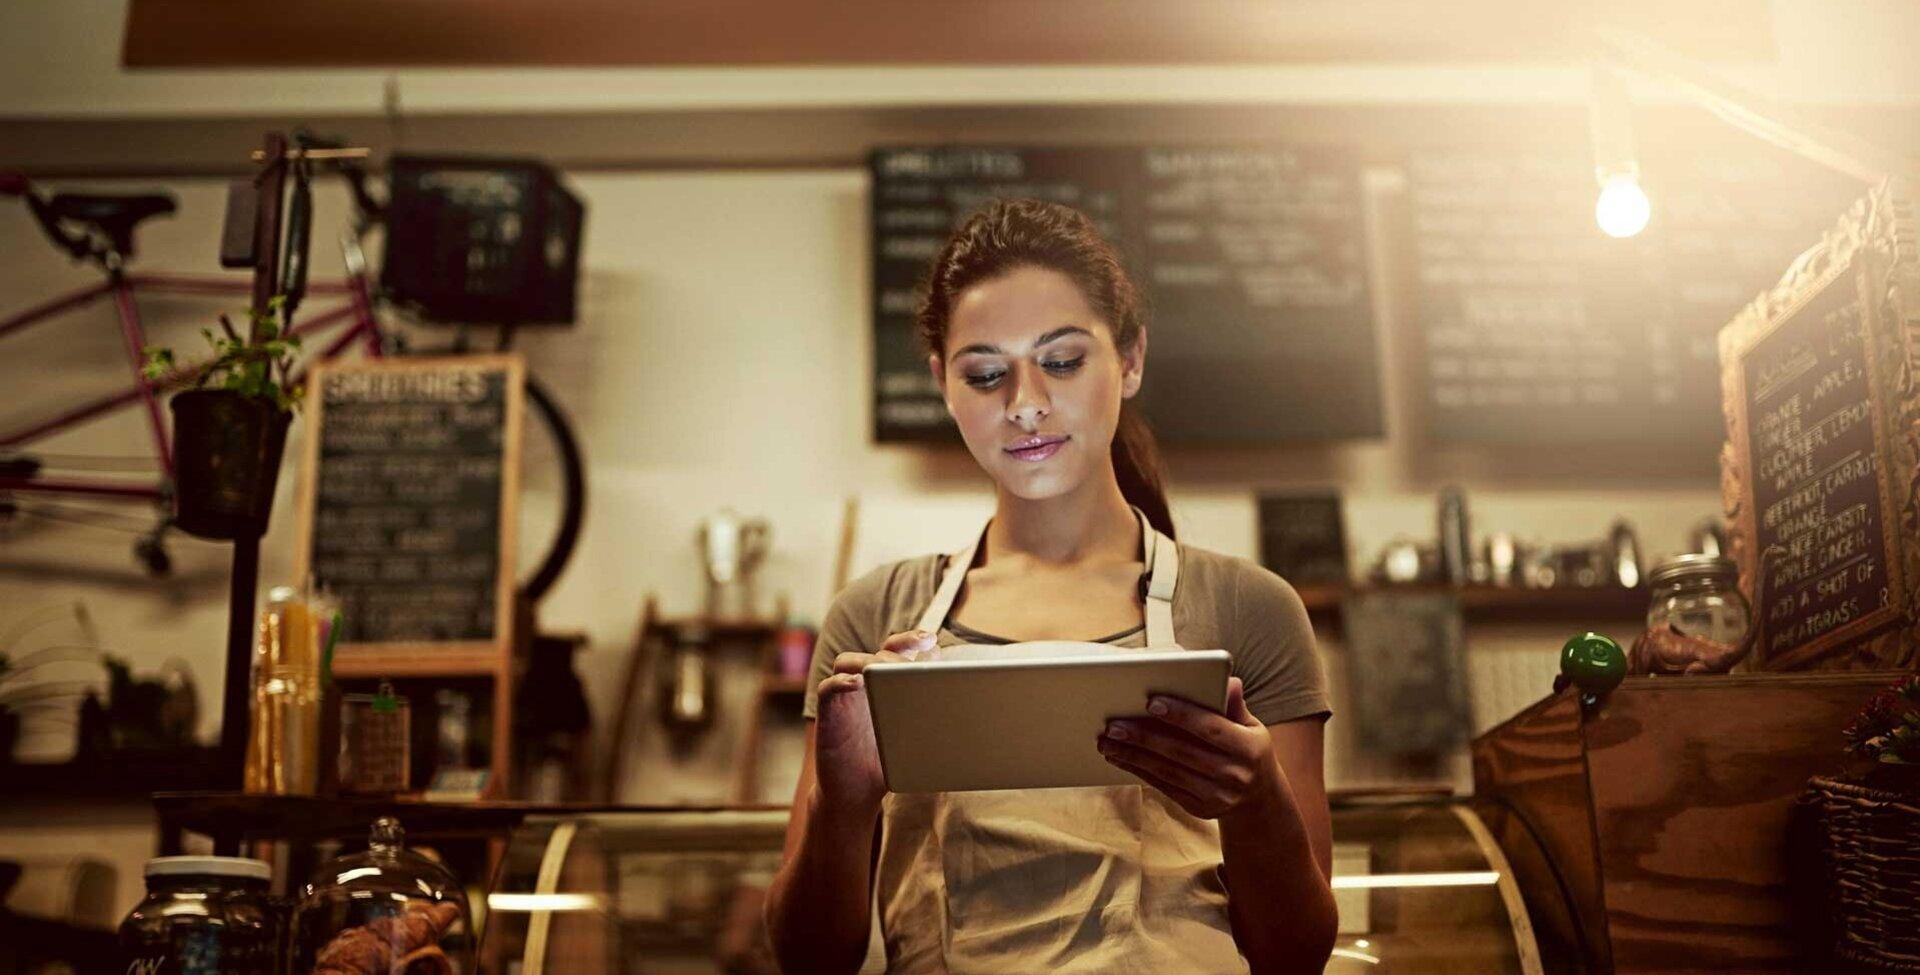 Cafébesitzerin optimiert Gastronomie-Konzept am iPad